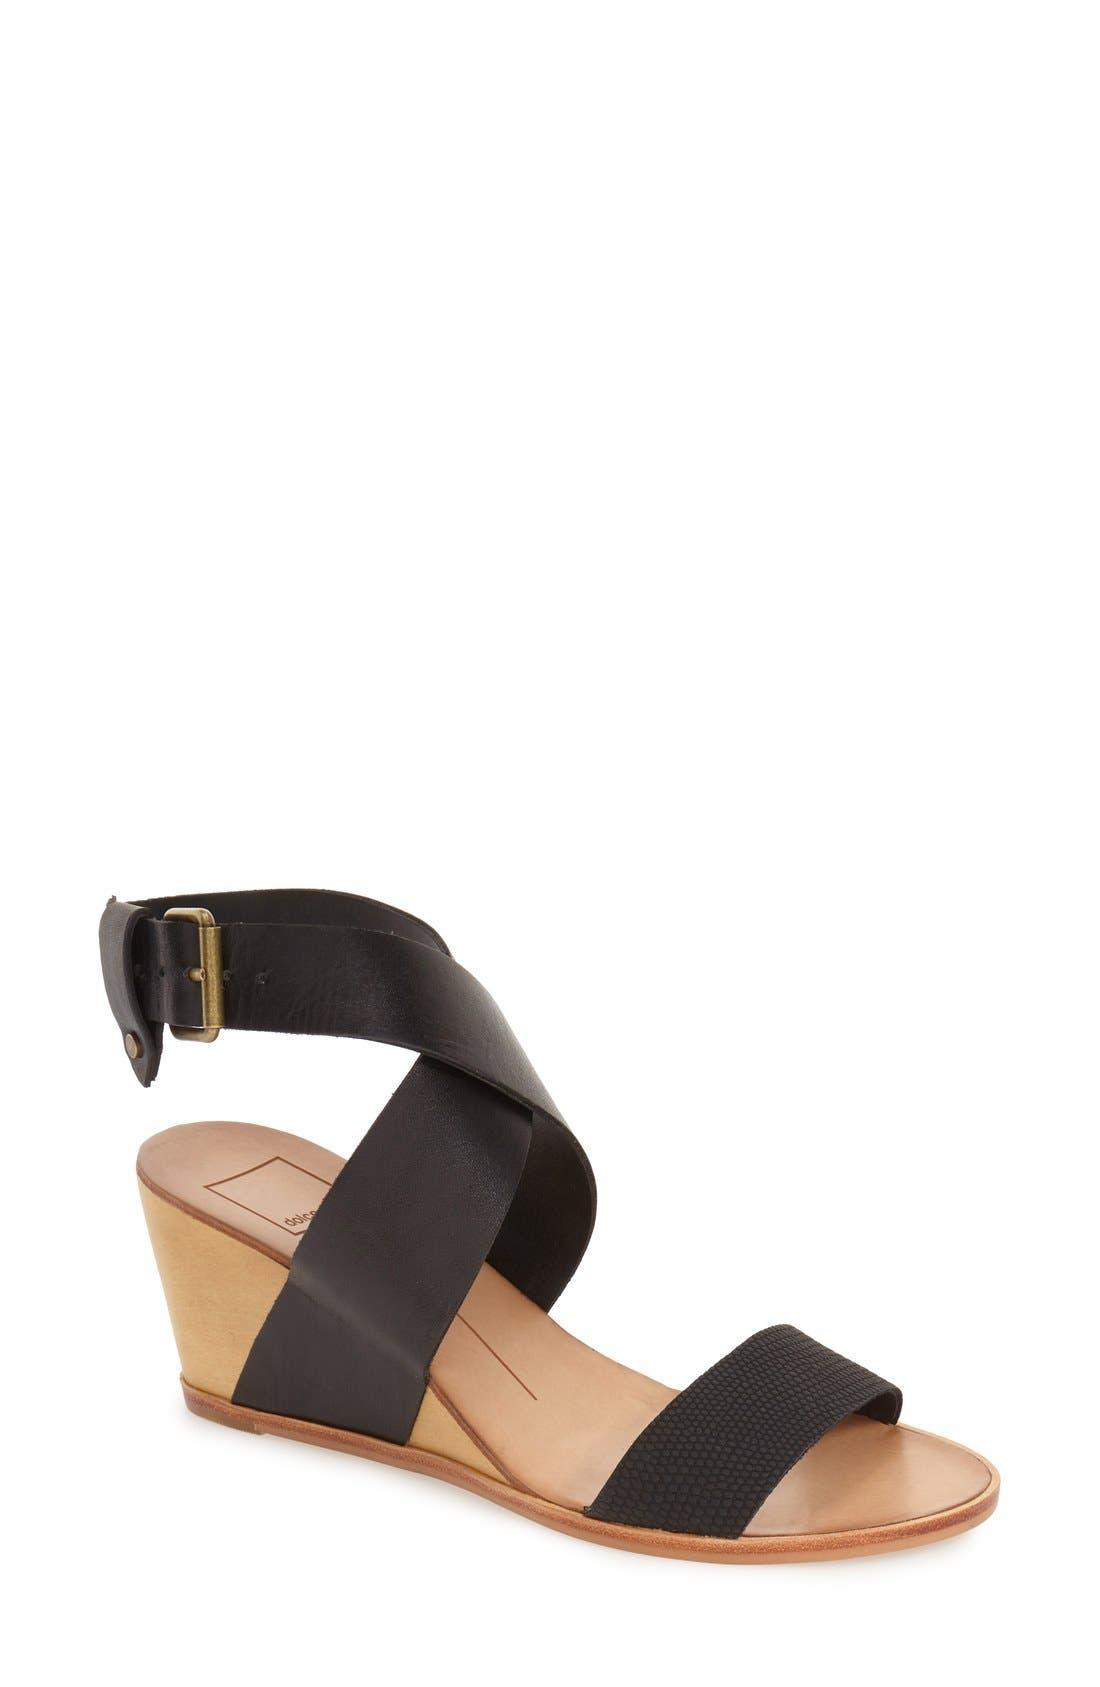 'Lola' Wedge Sandal, Main, color, 001